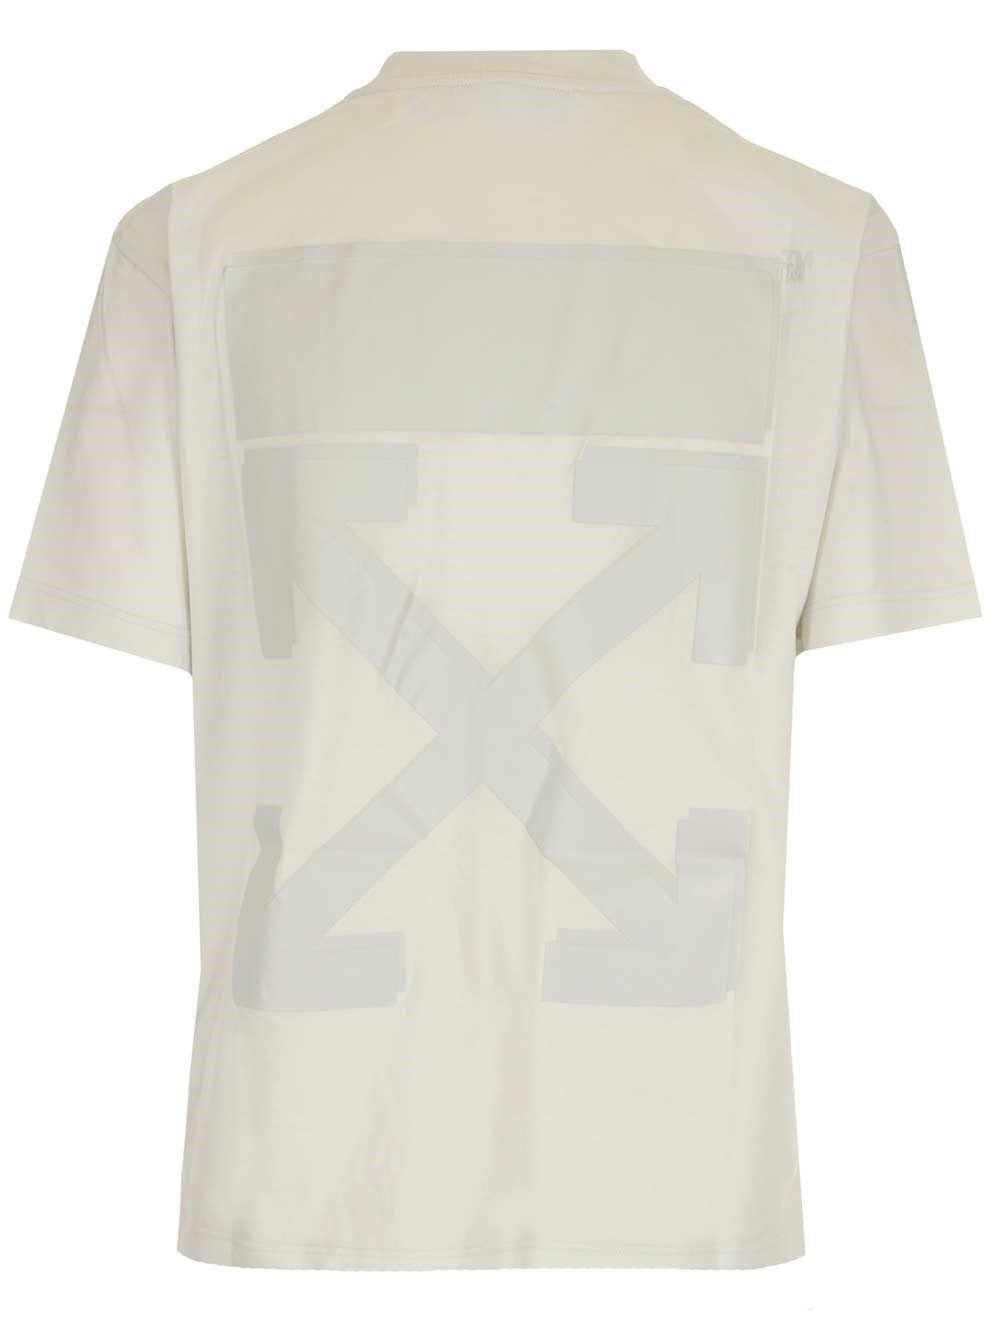 OFF-WHITE Cottons OFF-WHITE WOMEN'S WHITE COTTON T-SHIRT